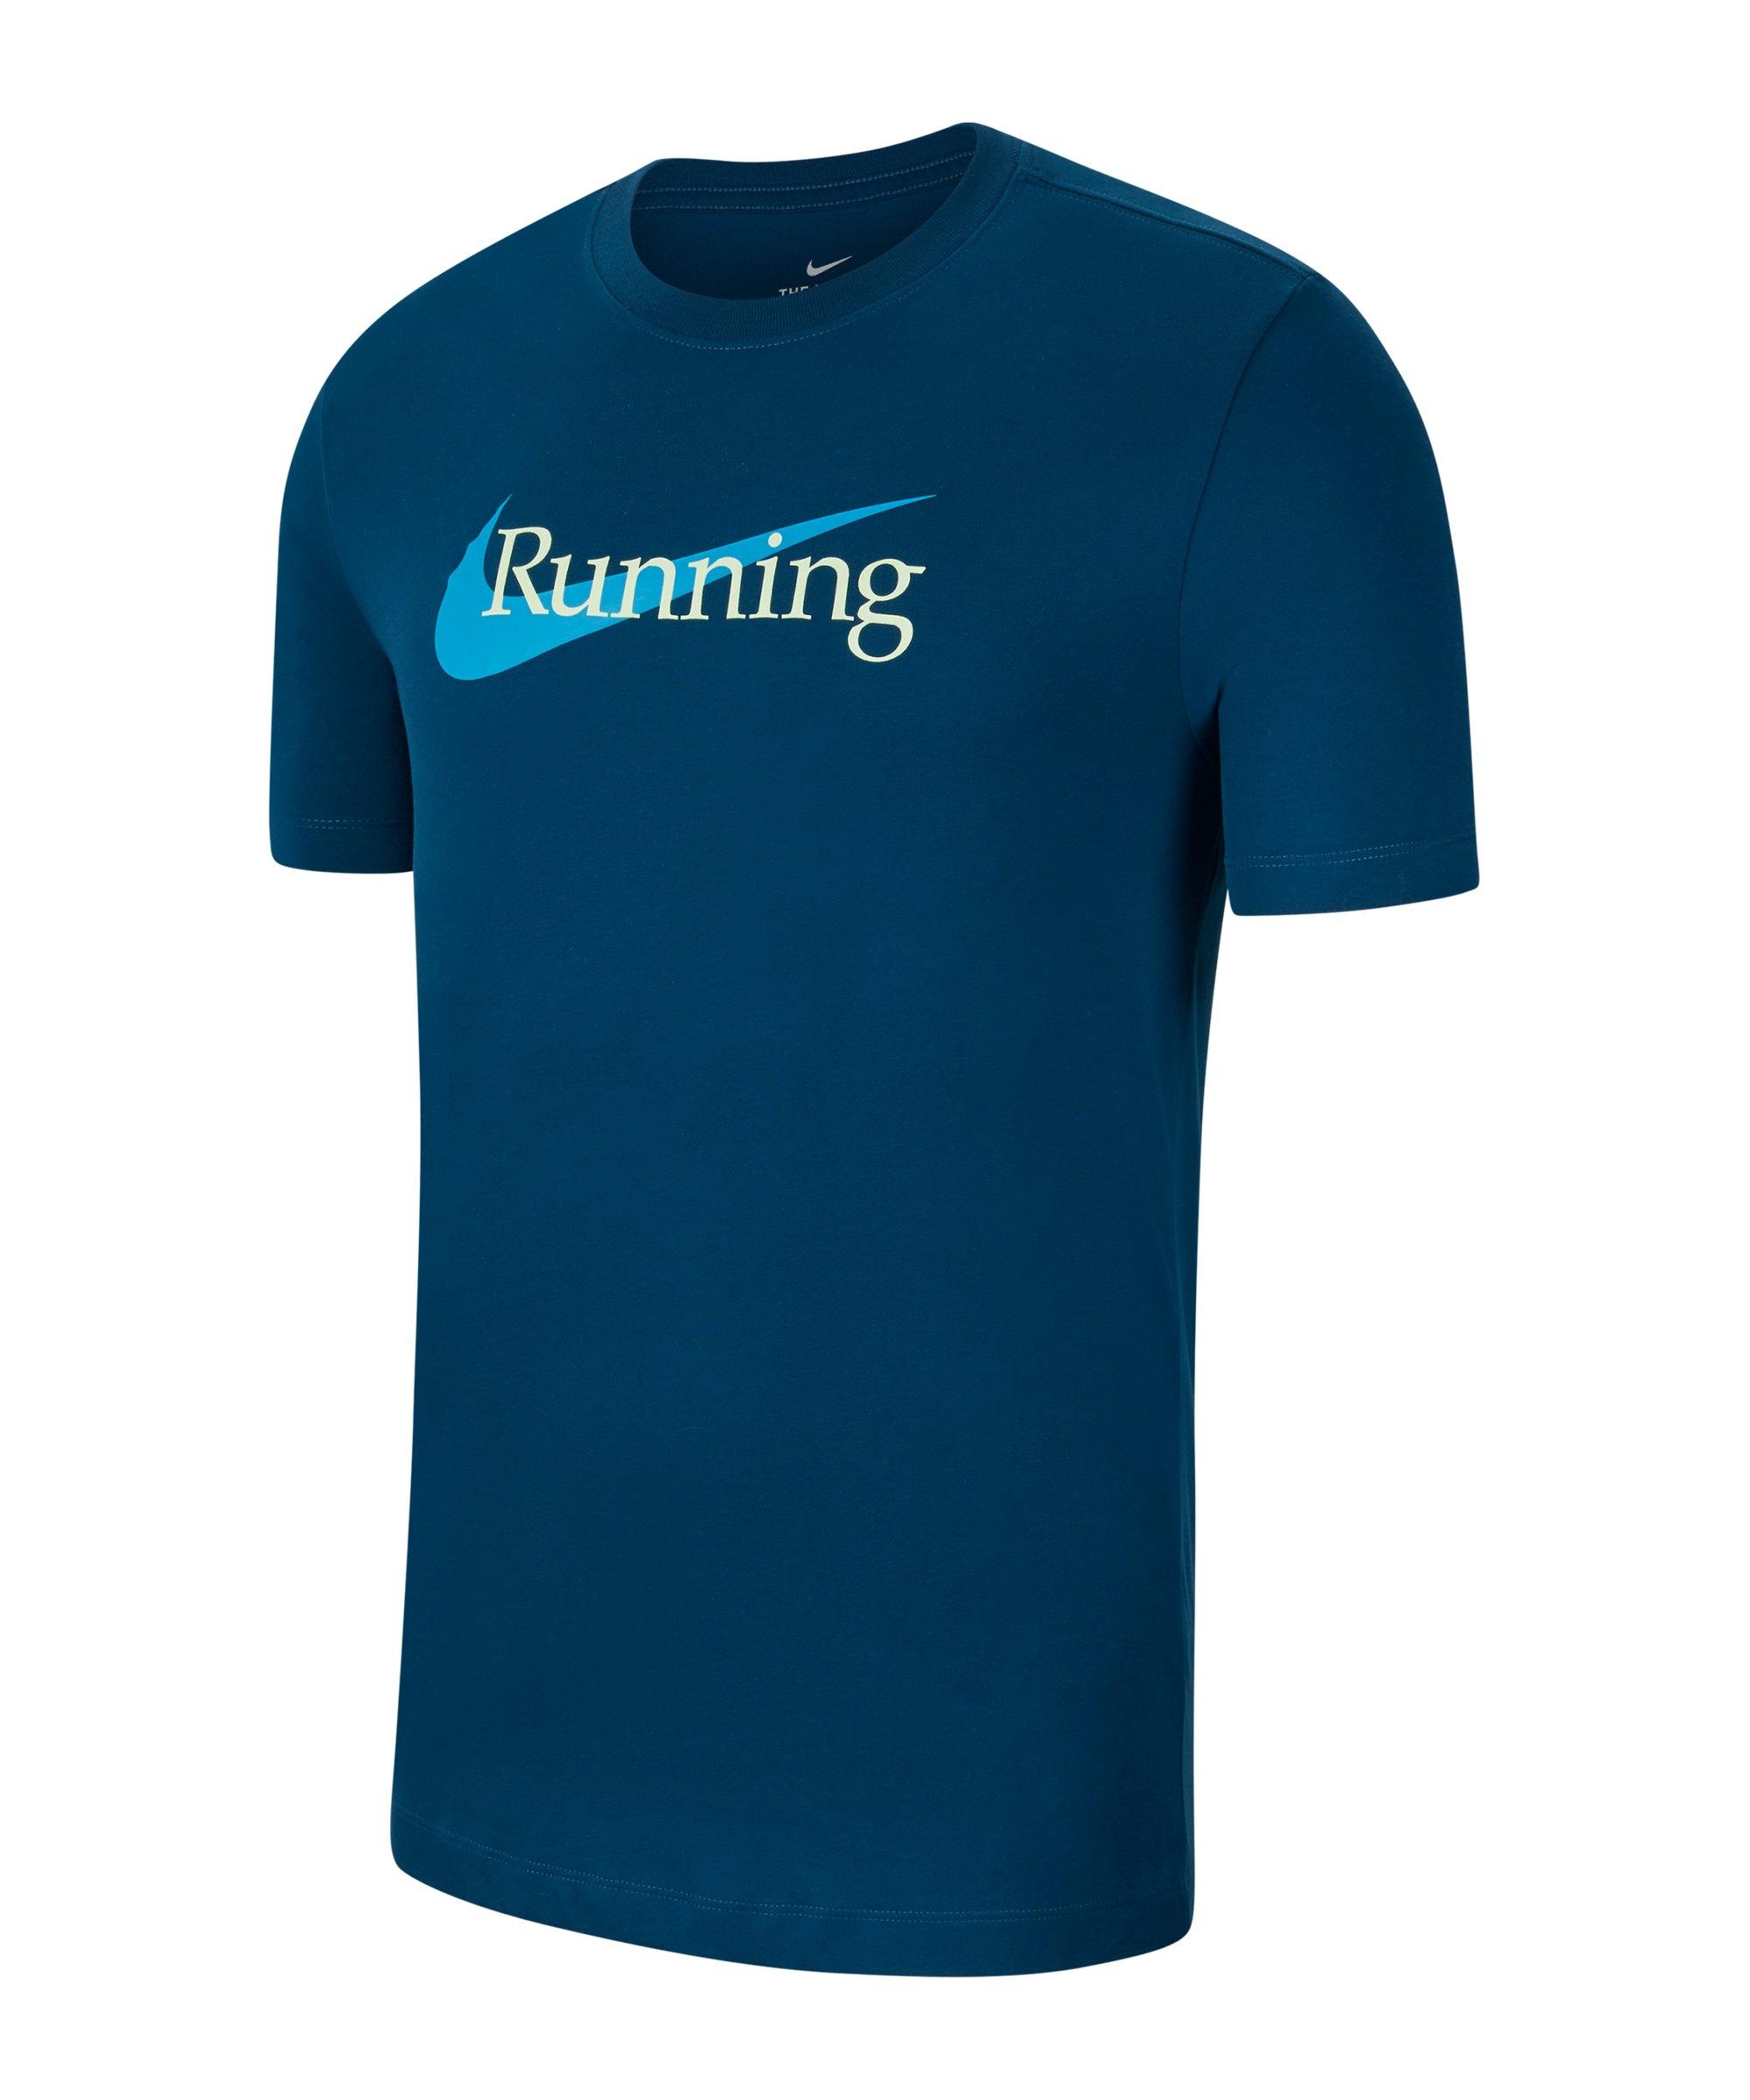 Nike HBR T-Shirt Running Blau F460 - blau